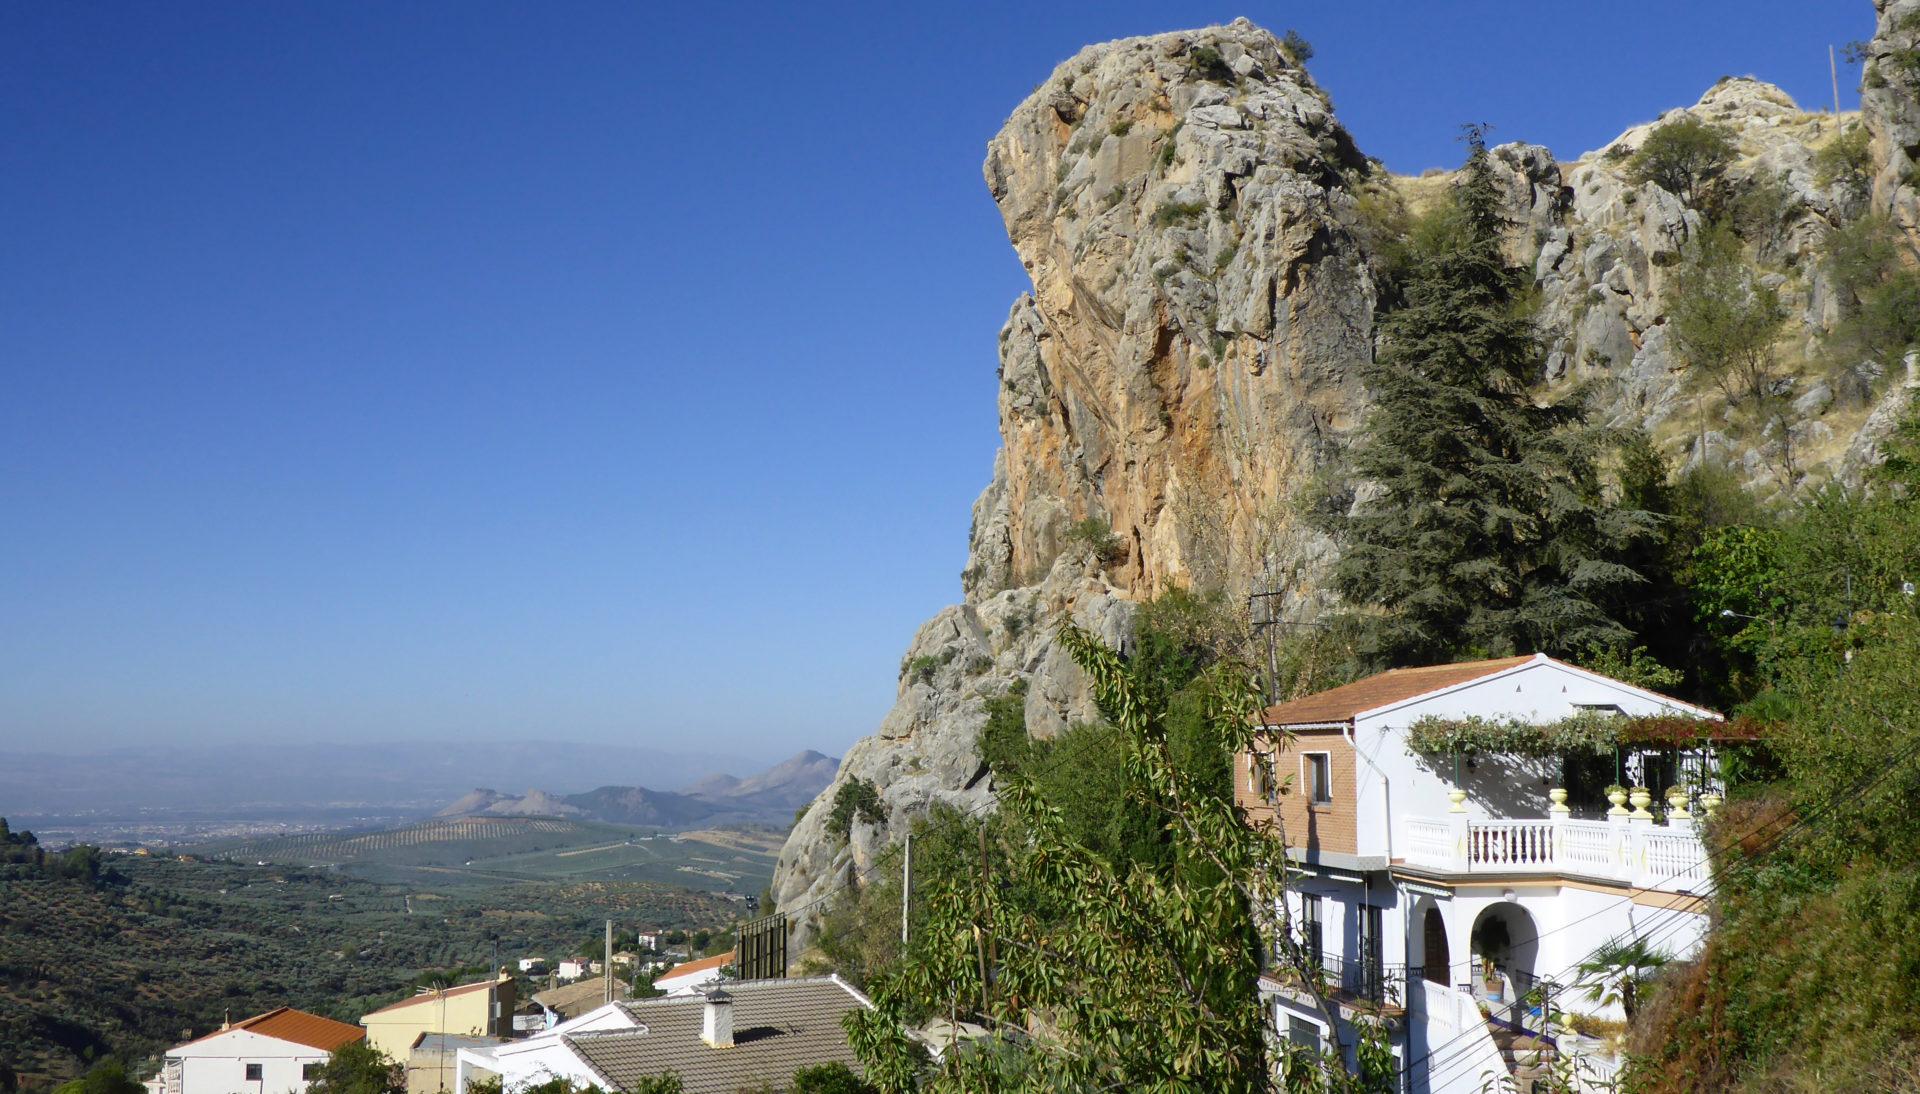 Solana de Granada